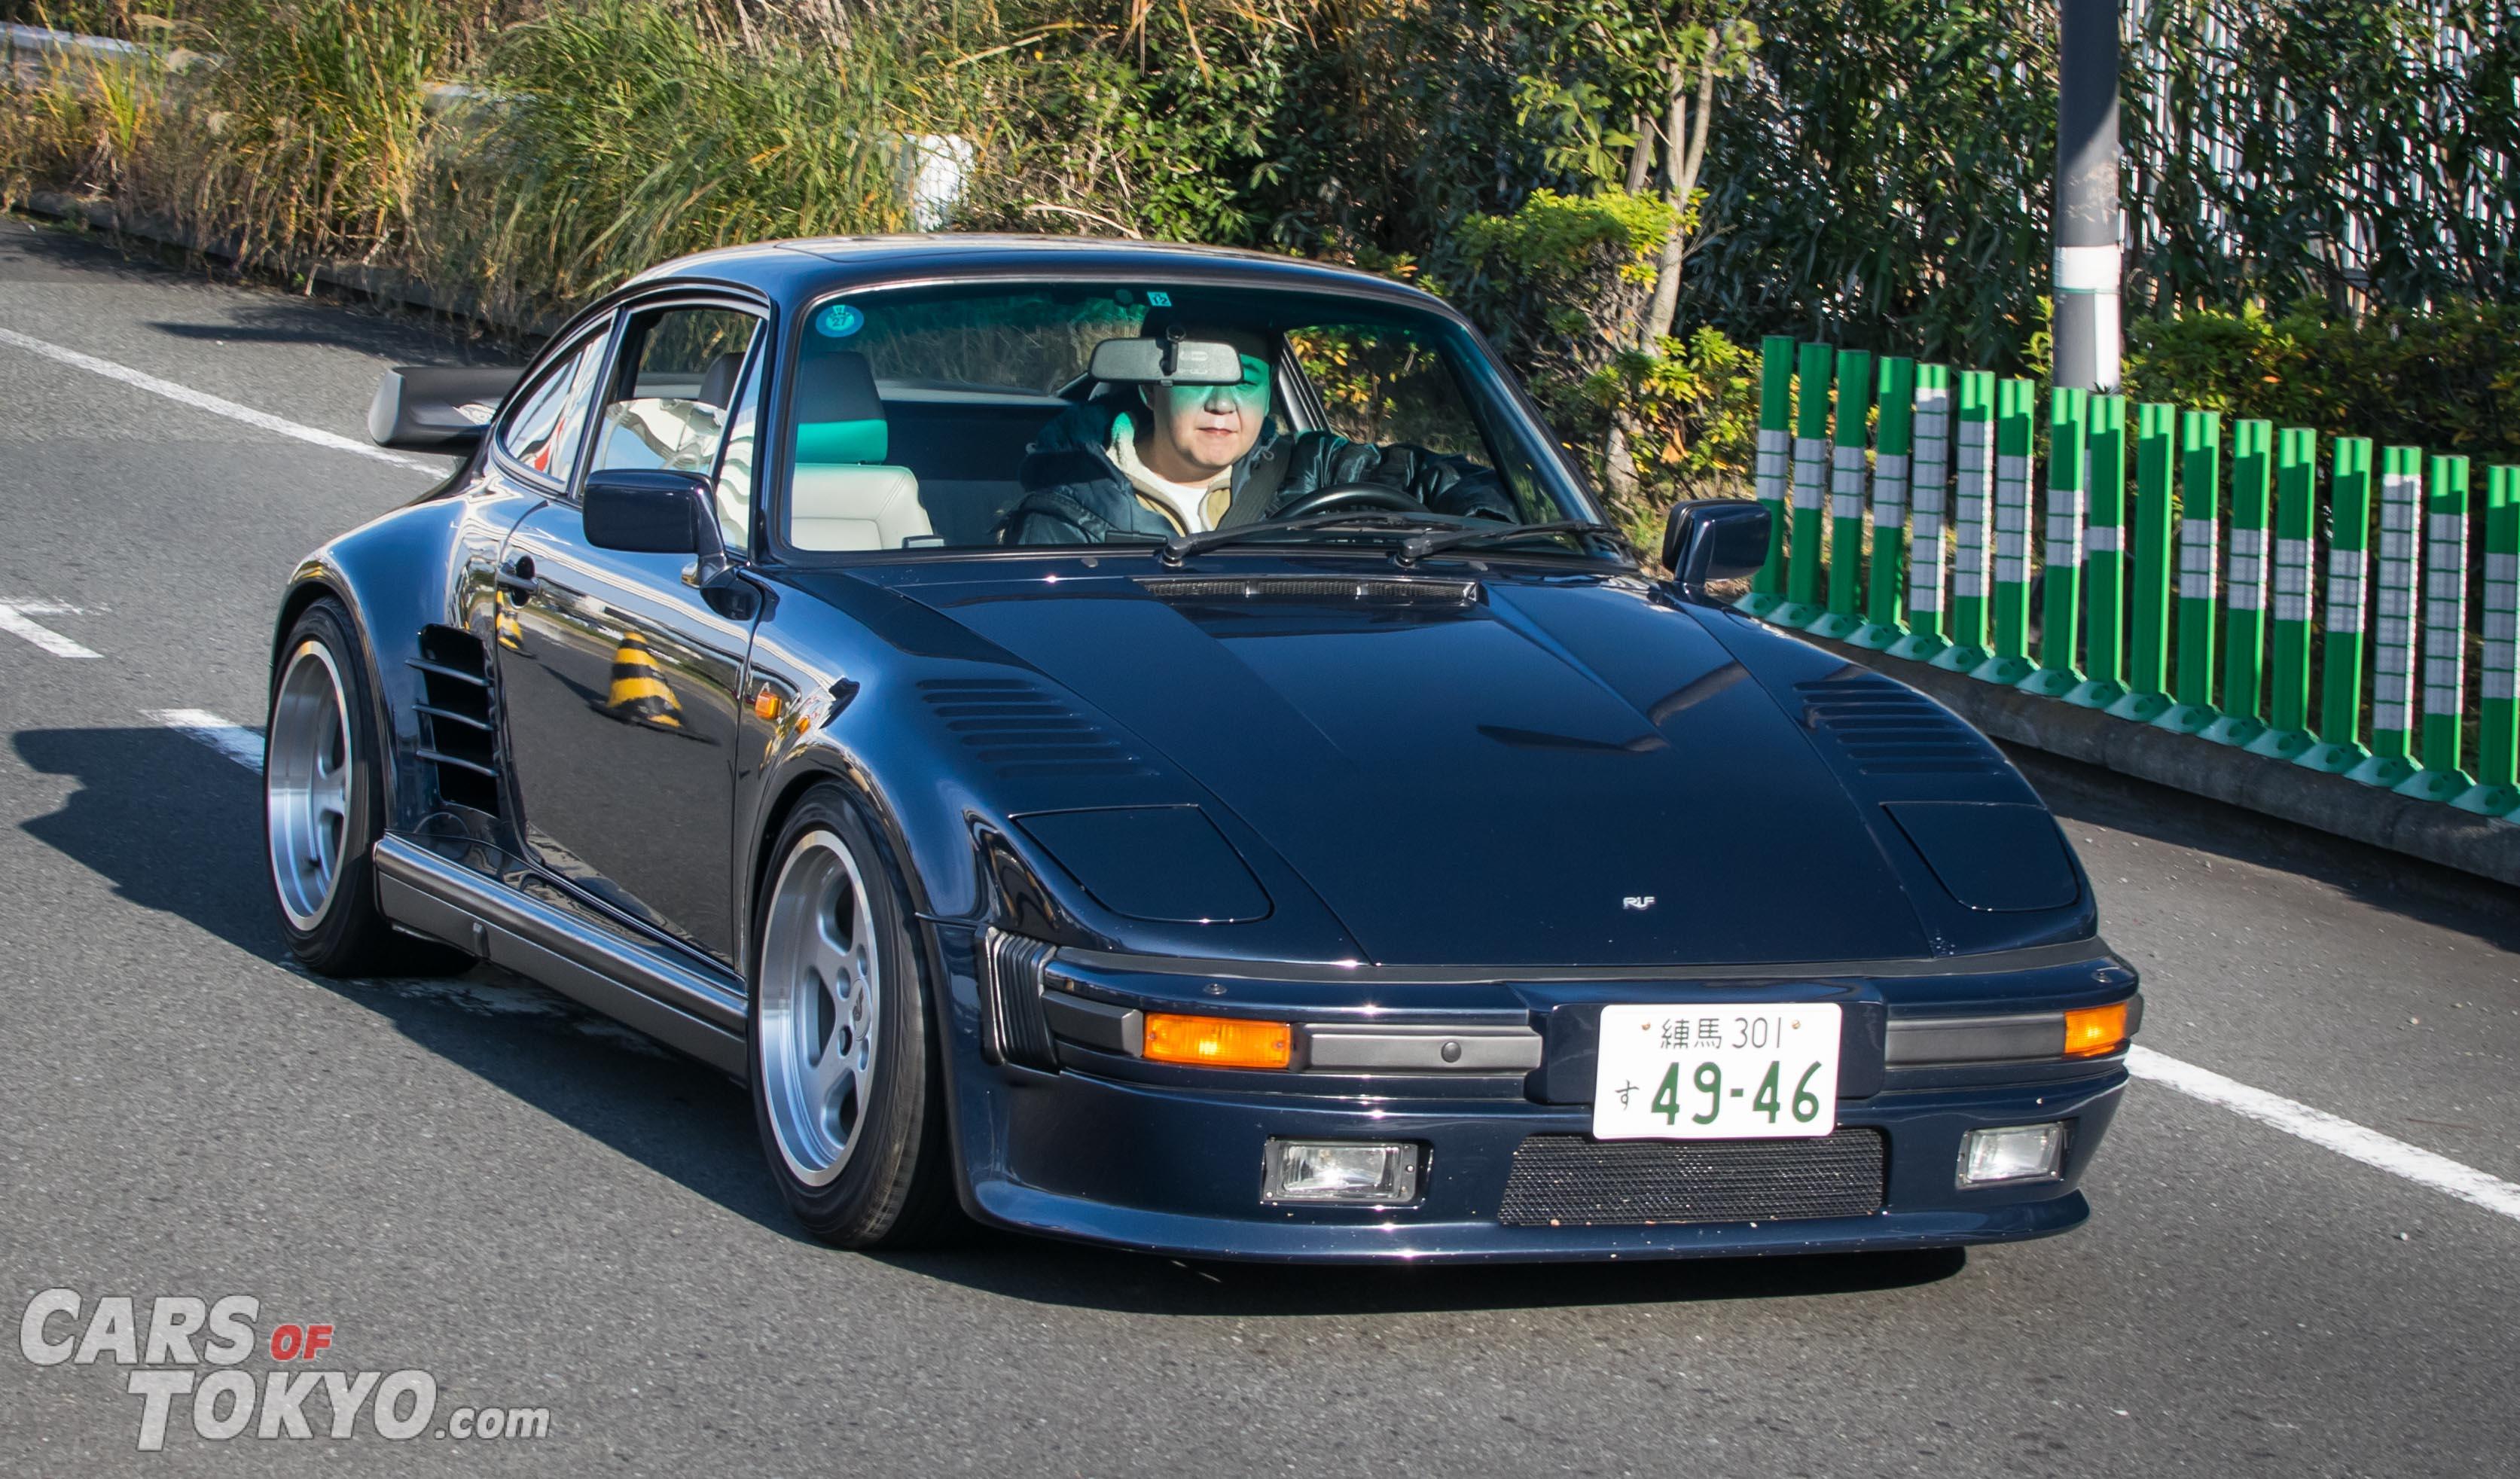 Cars of Tokyo Classic Porsche 911 Slantnose RUF